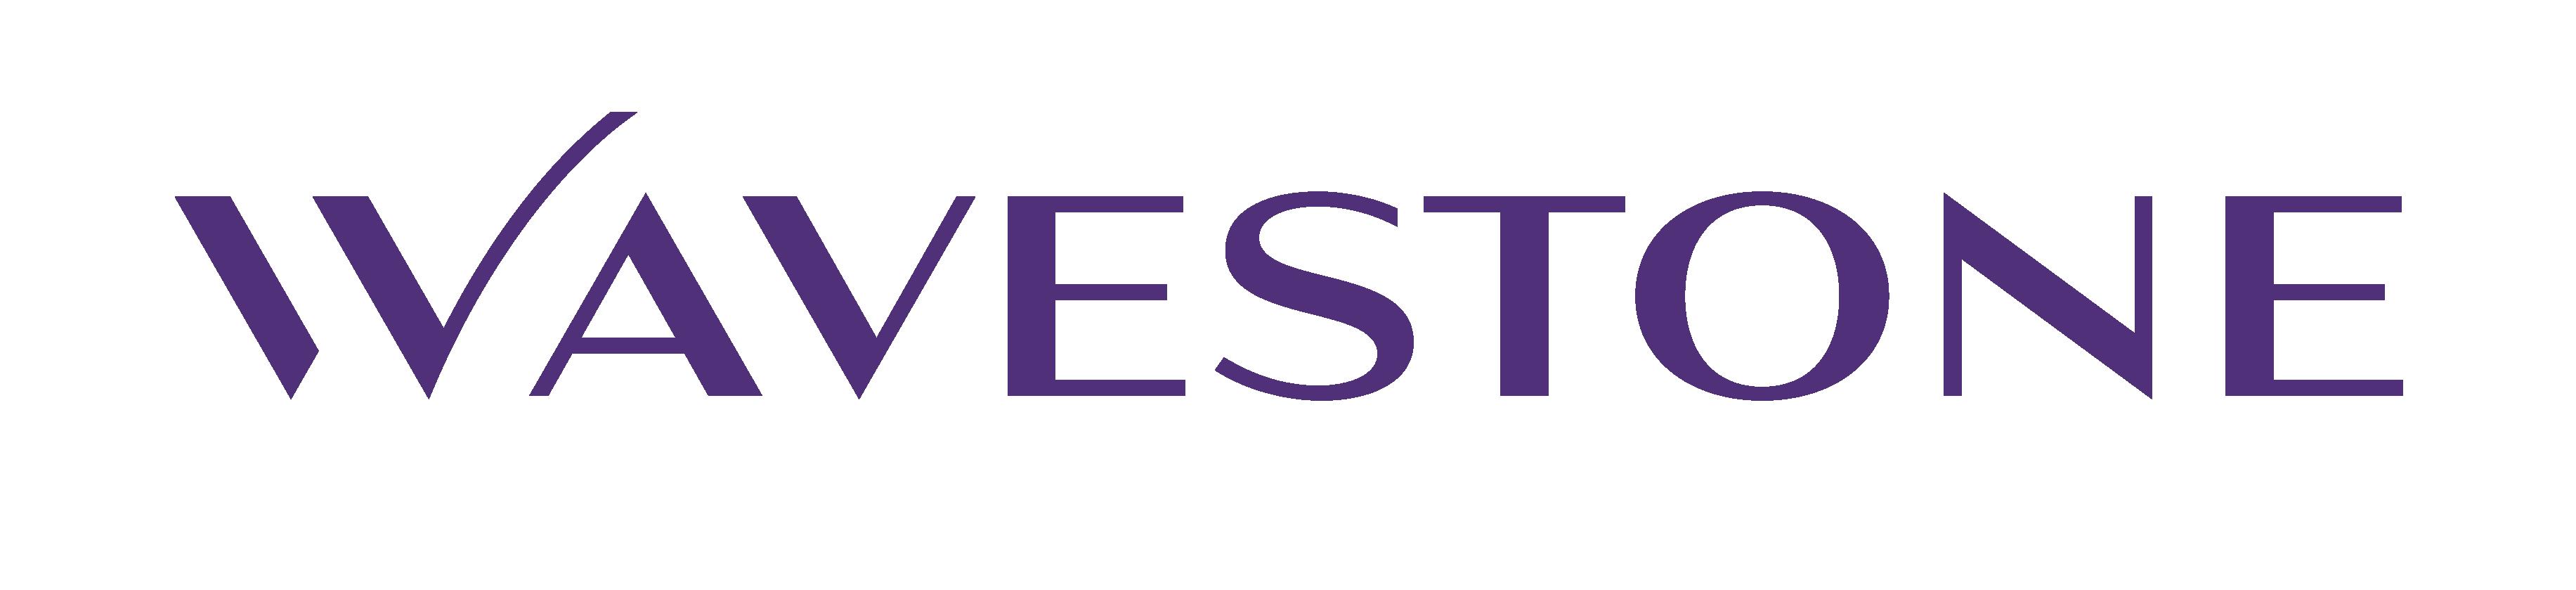 wavestone_logo